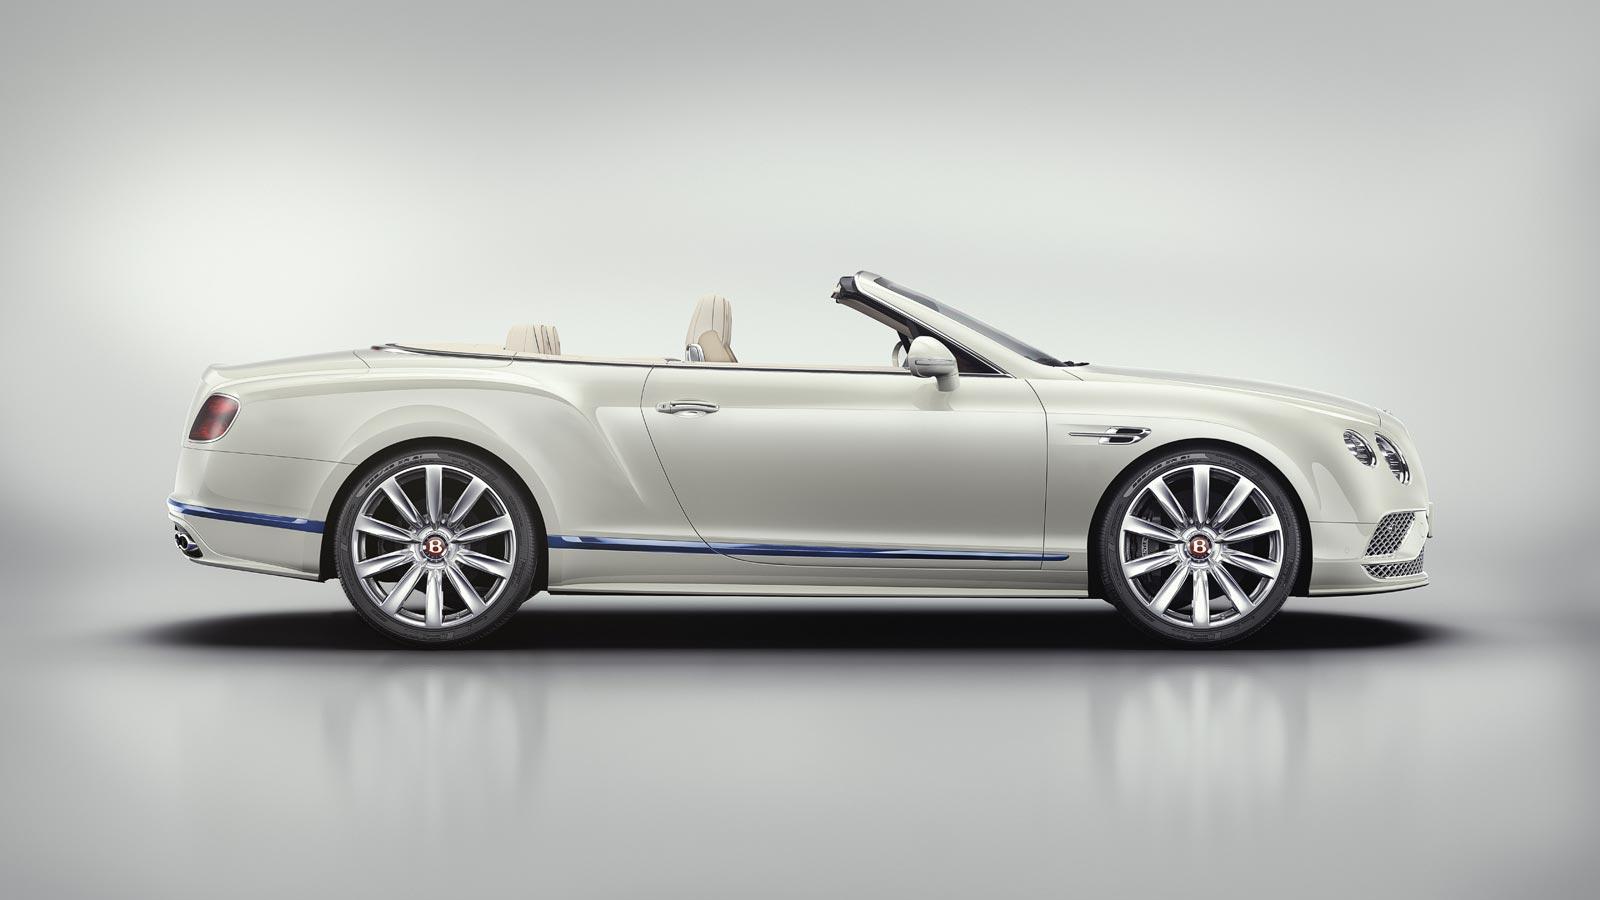 Bentley Motors and Princess Yachts Continental GT Convertible Galene Edition 7